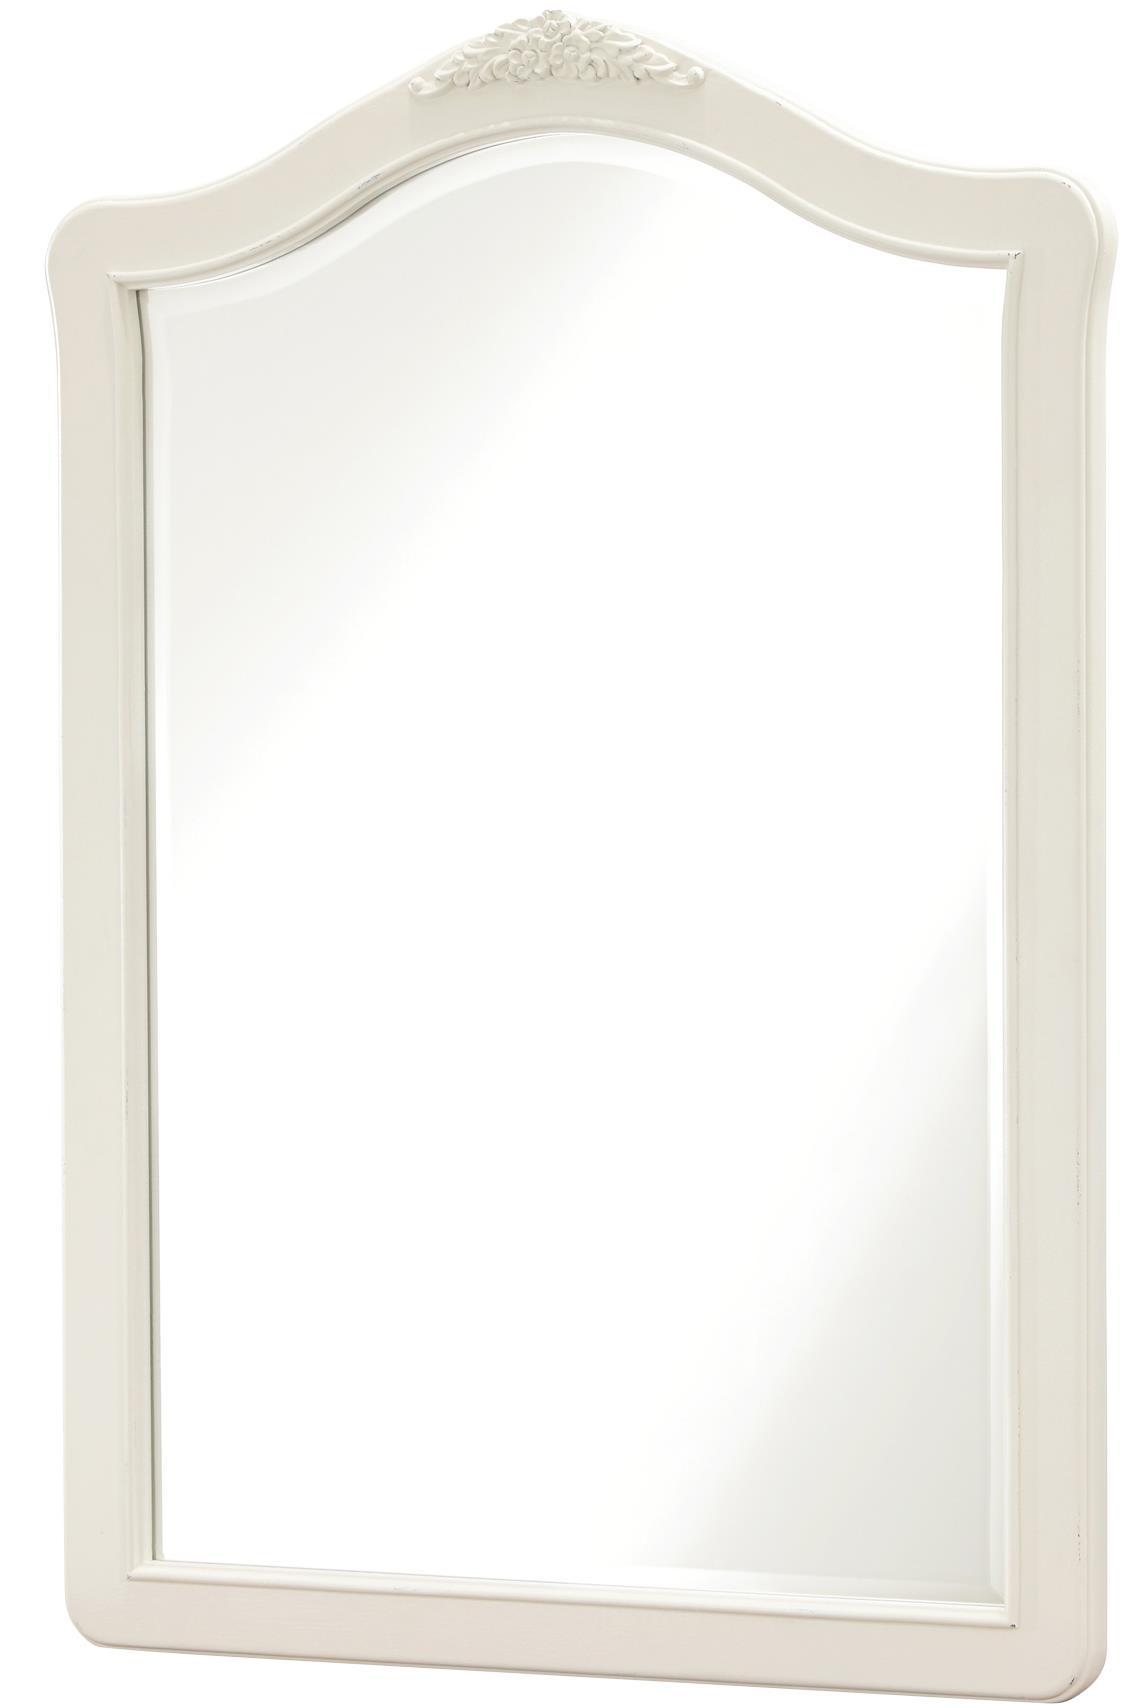 Morris Home Penelope Penelope Mademoiselle Vertical Mirror - Item Number: 434A031